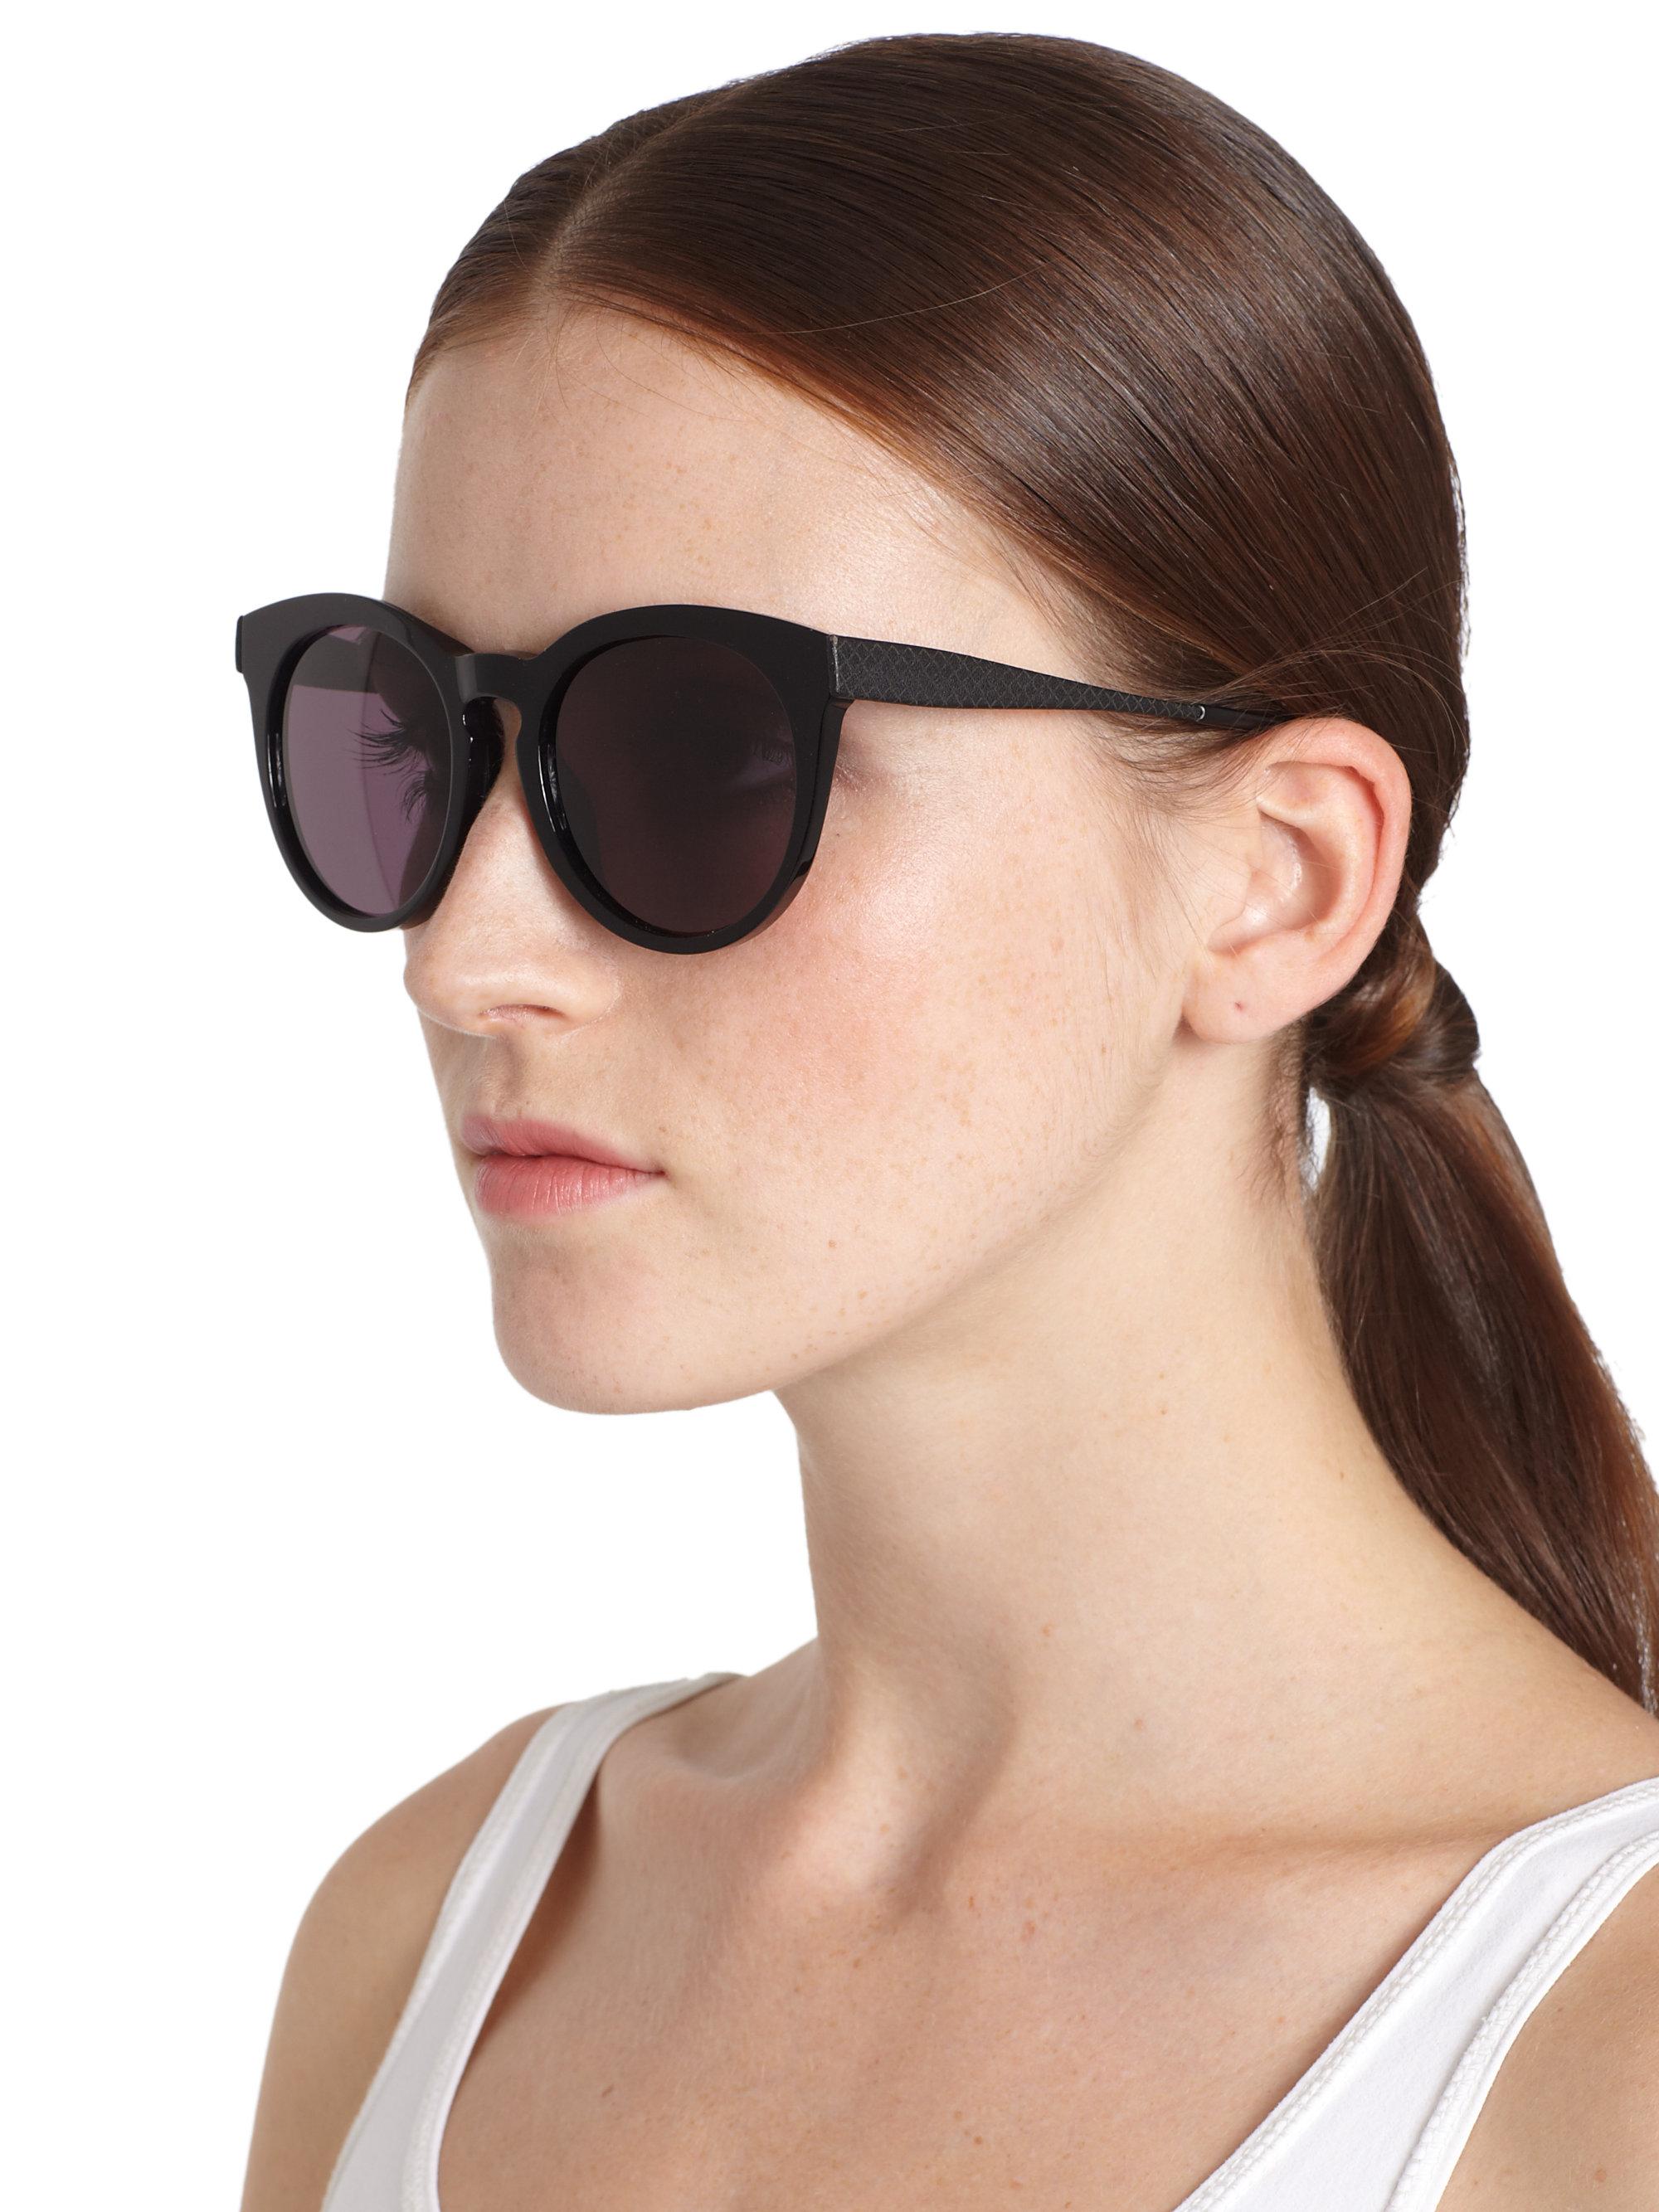 2683e78b4a Lyst - Bottega Veneta Oversized Round Sunglasses in Black